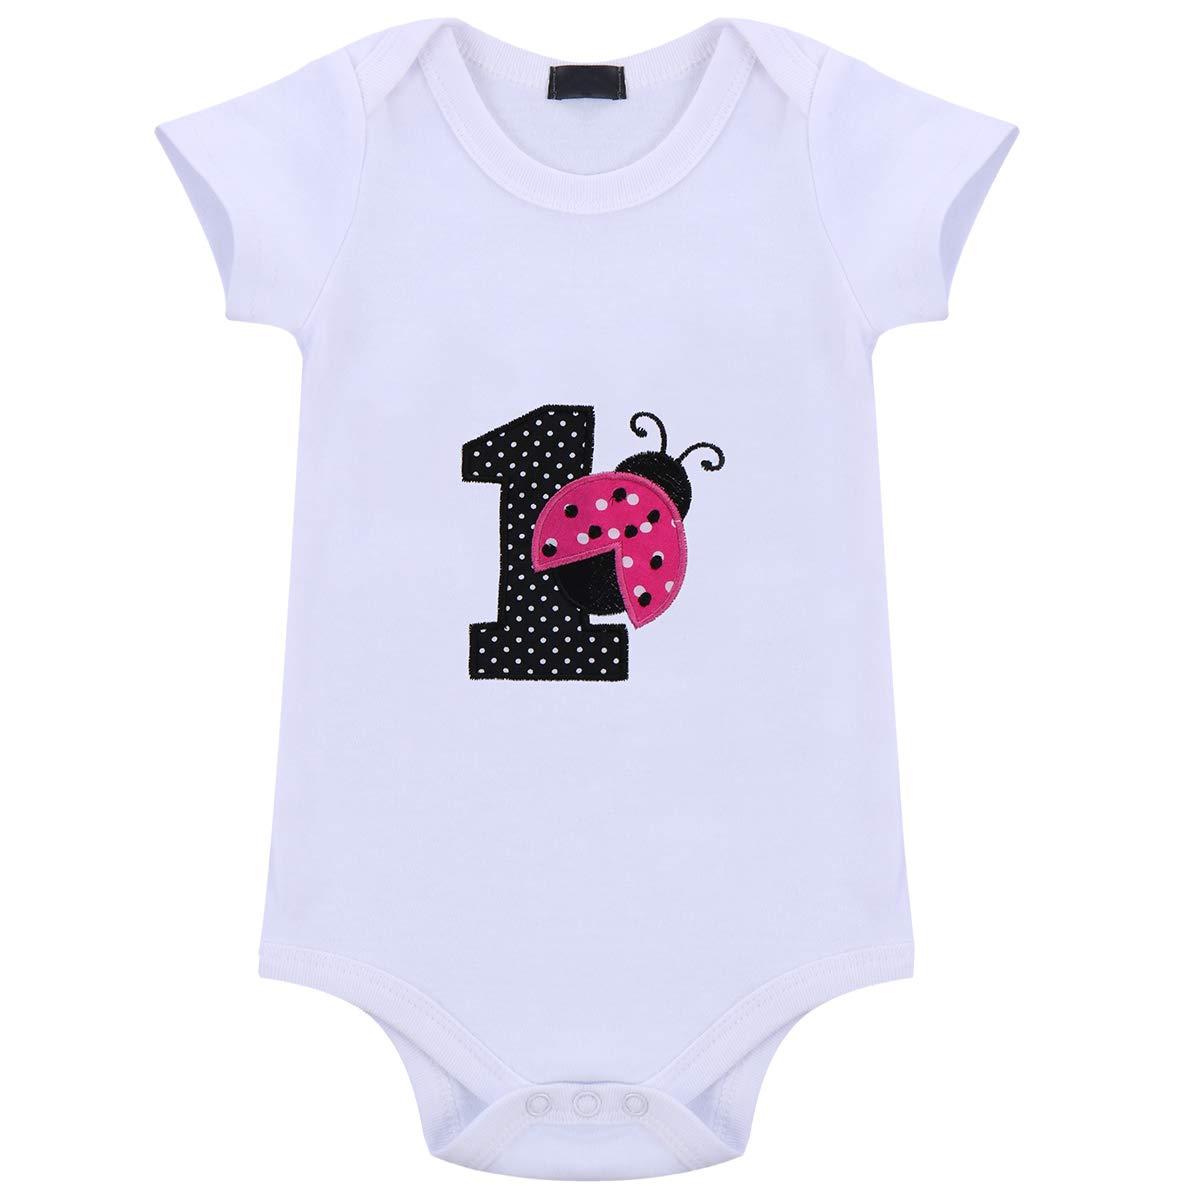 c135f239e6f75 Amazon.com: Baby Girls 3PCS Ladybug One Polka Dots 1st Birthday Outfit  Romper with Tutu Skirt and Headband Set Hot Pink: Clothing